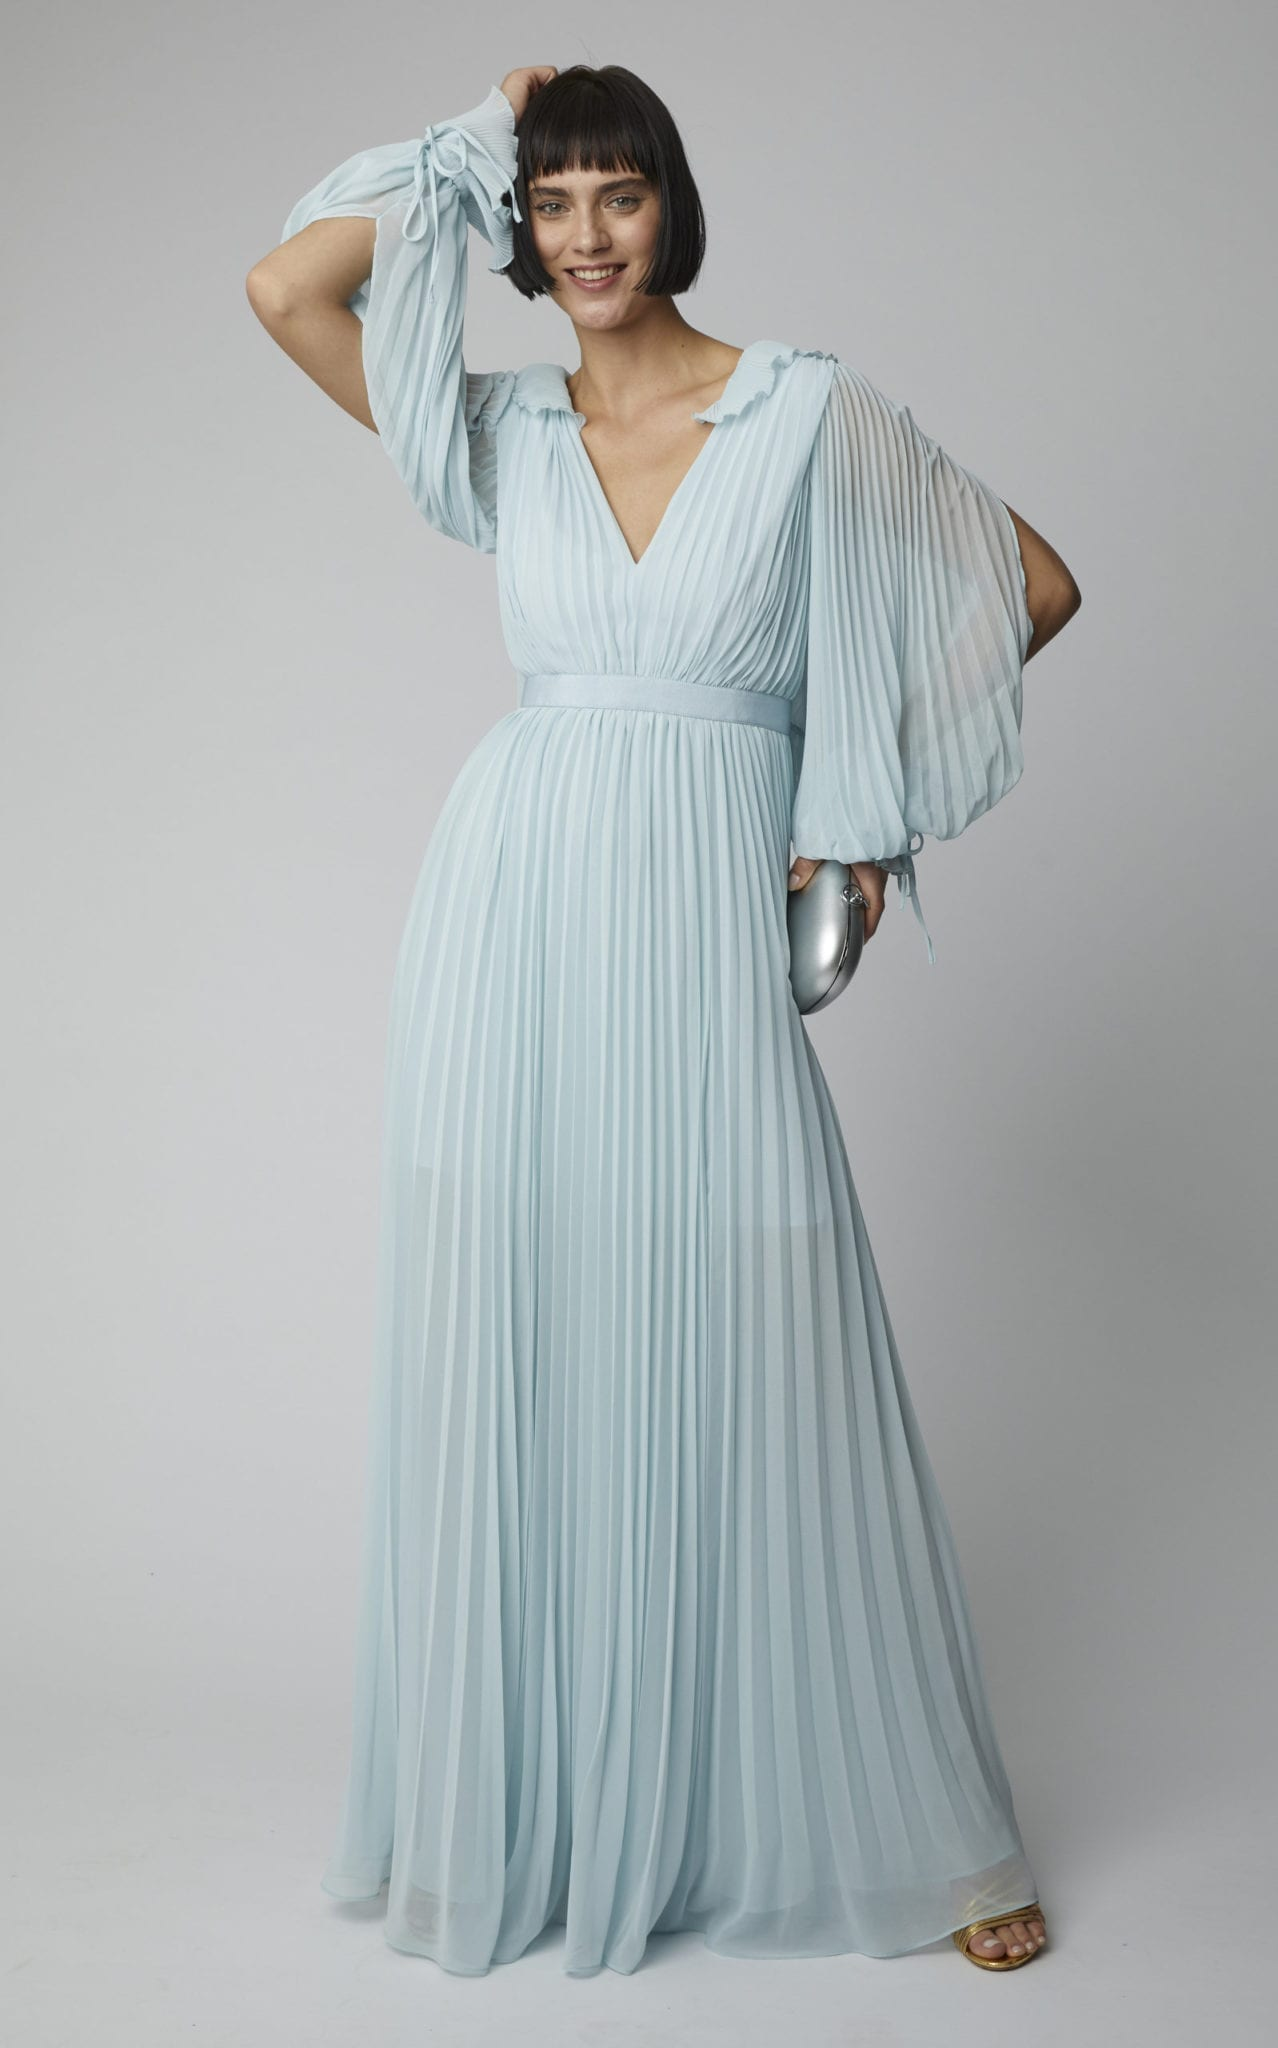 Pleated chiffon maxi dress with sleeves